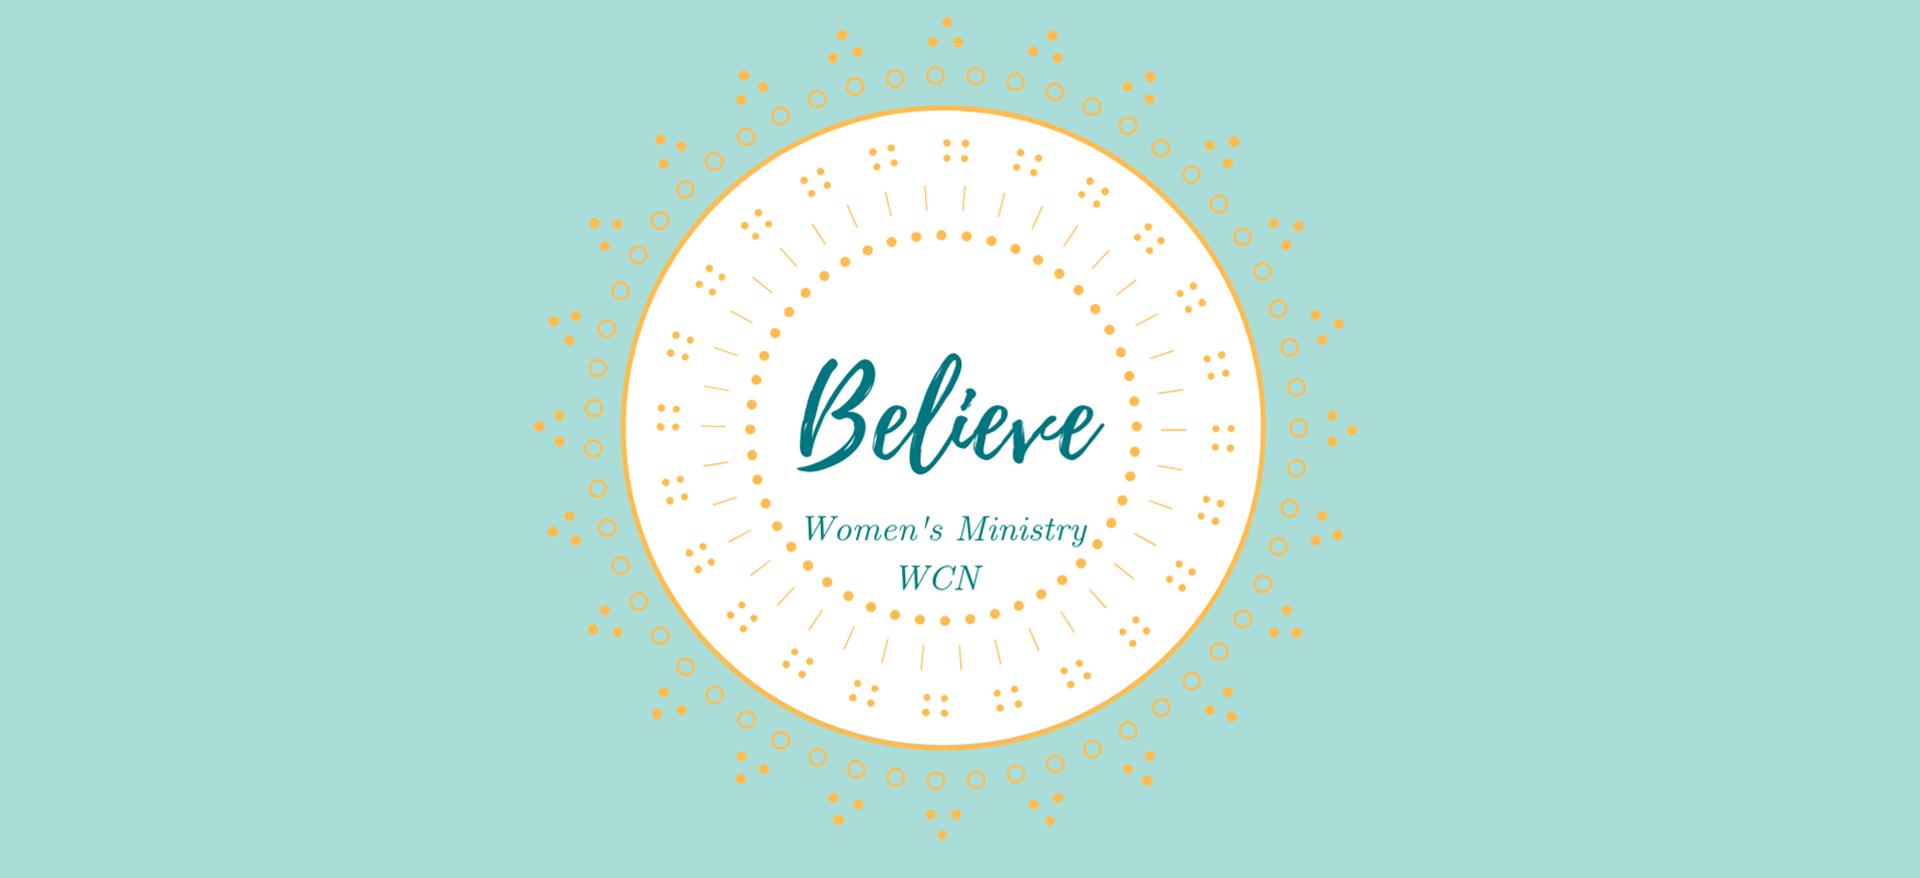 BELIEVE WM WCN 2019  logo no Bible verse wide.png